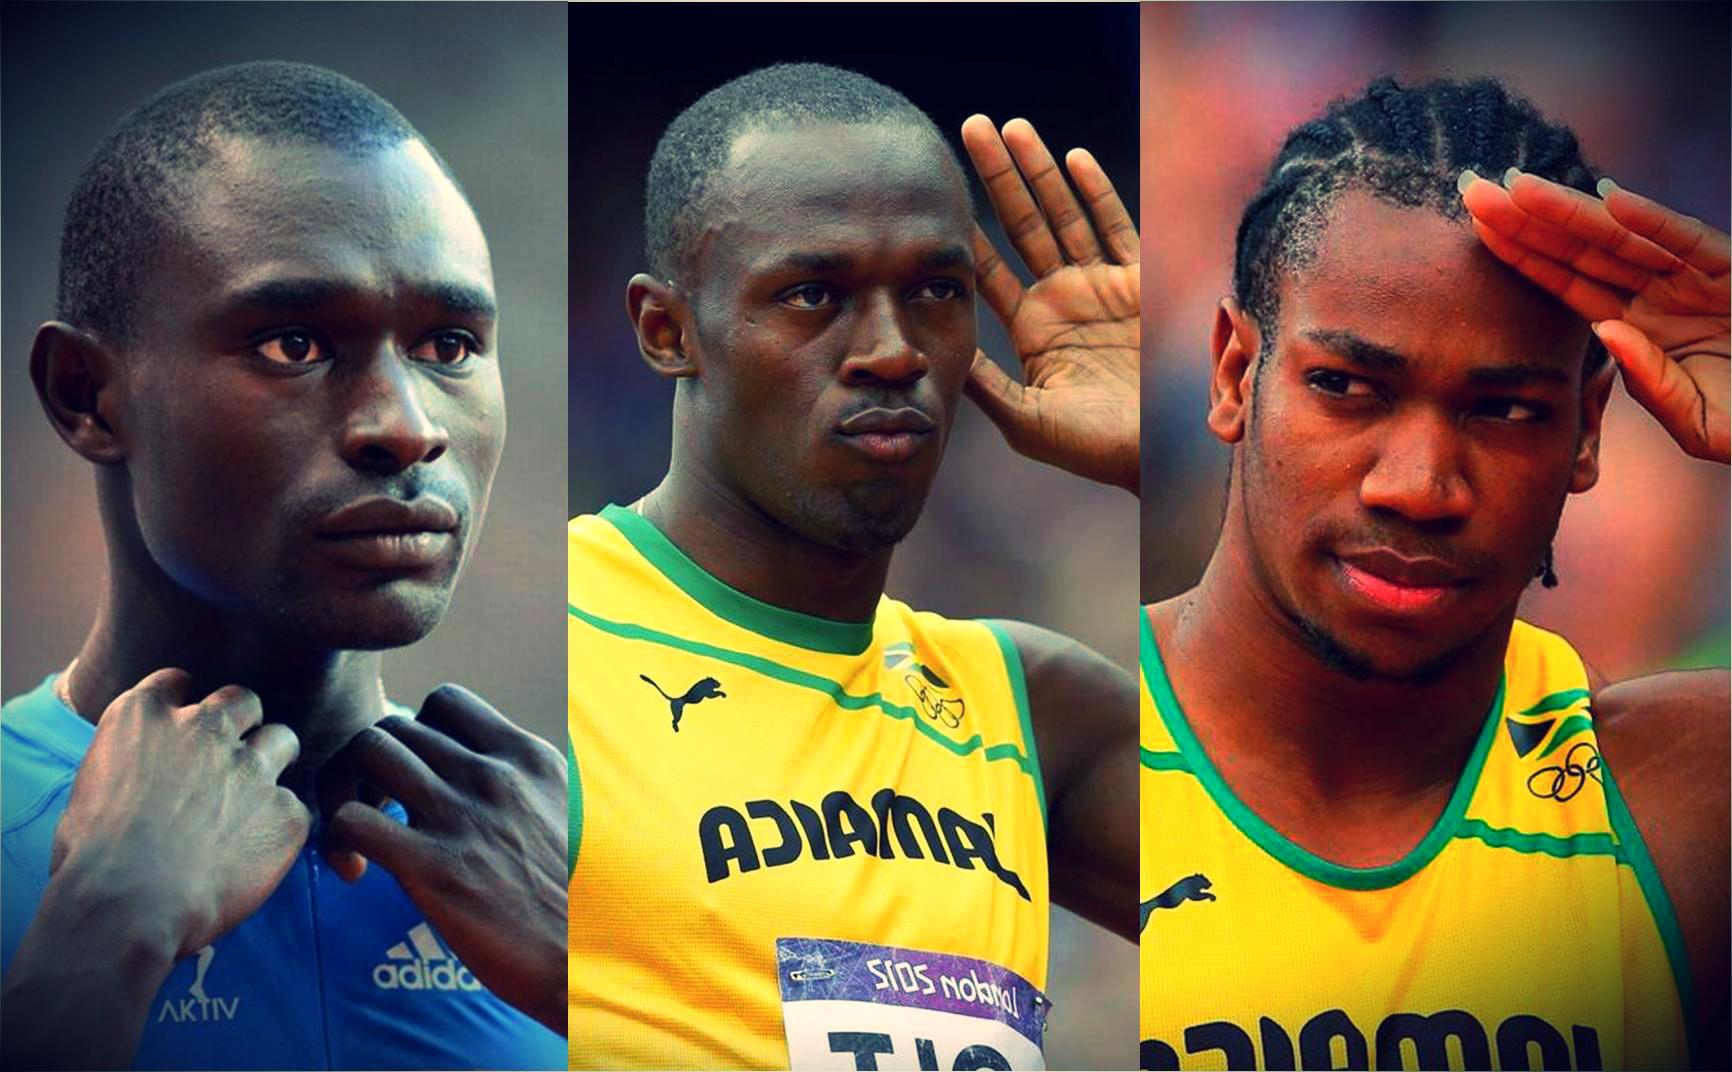 Usain Bolt y Yohan Blake vuelven a ganar, así lo vivimos